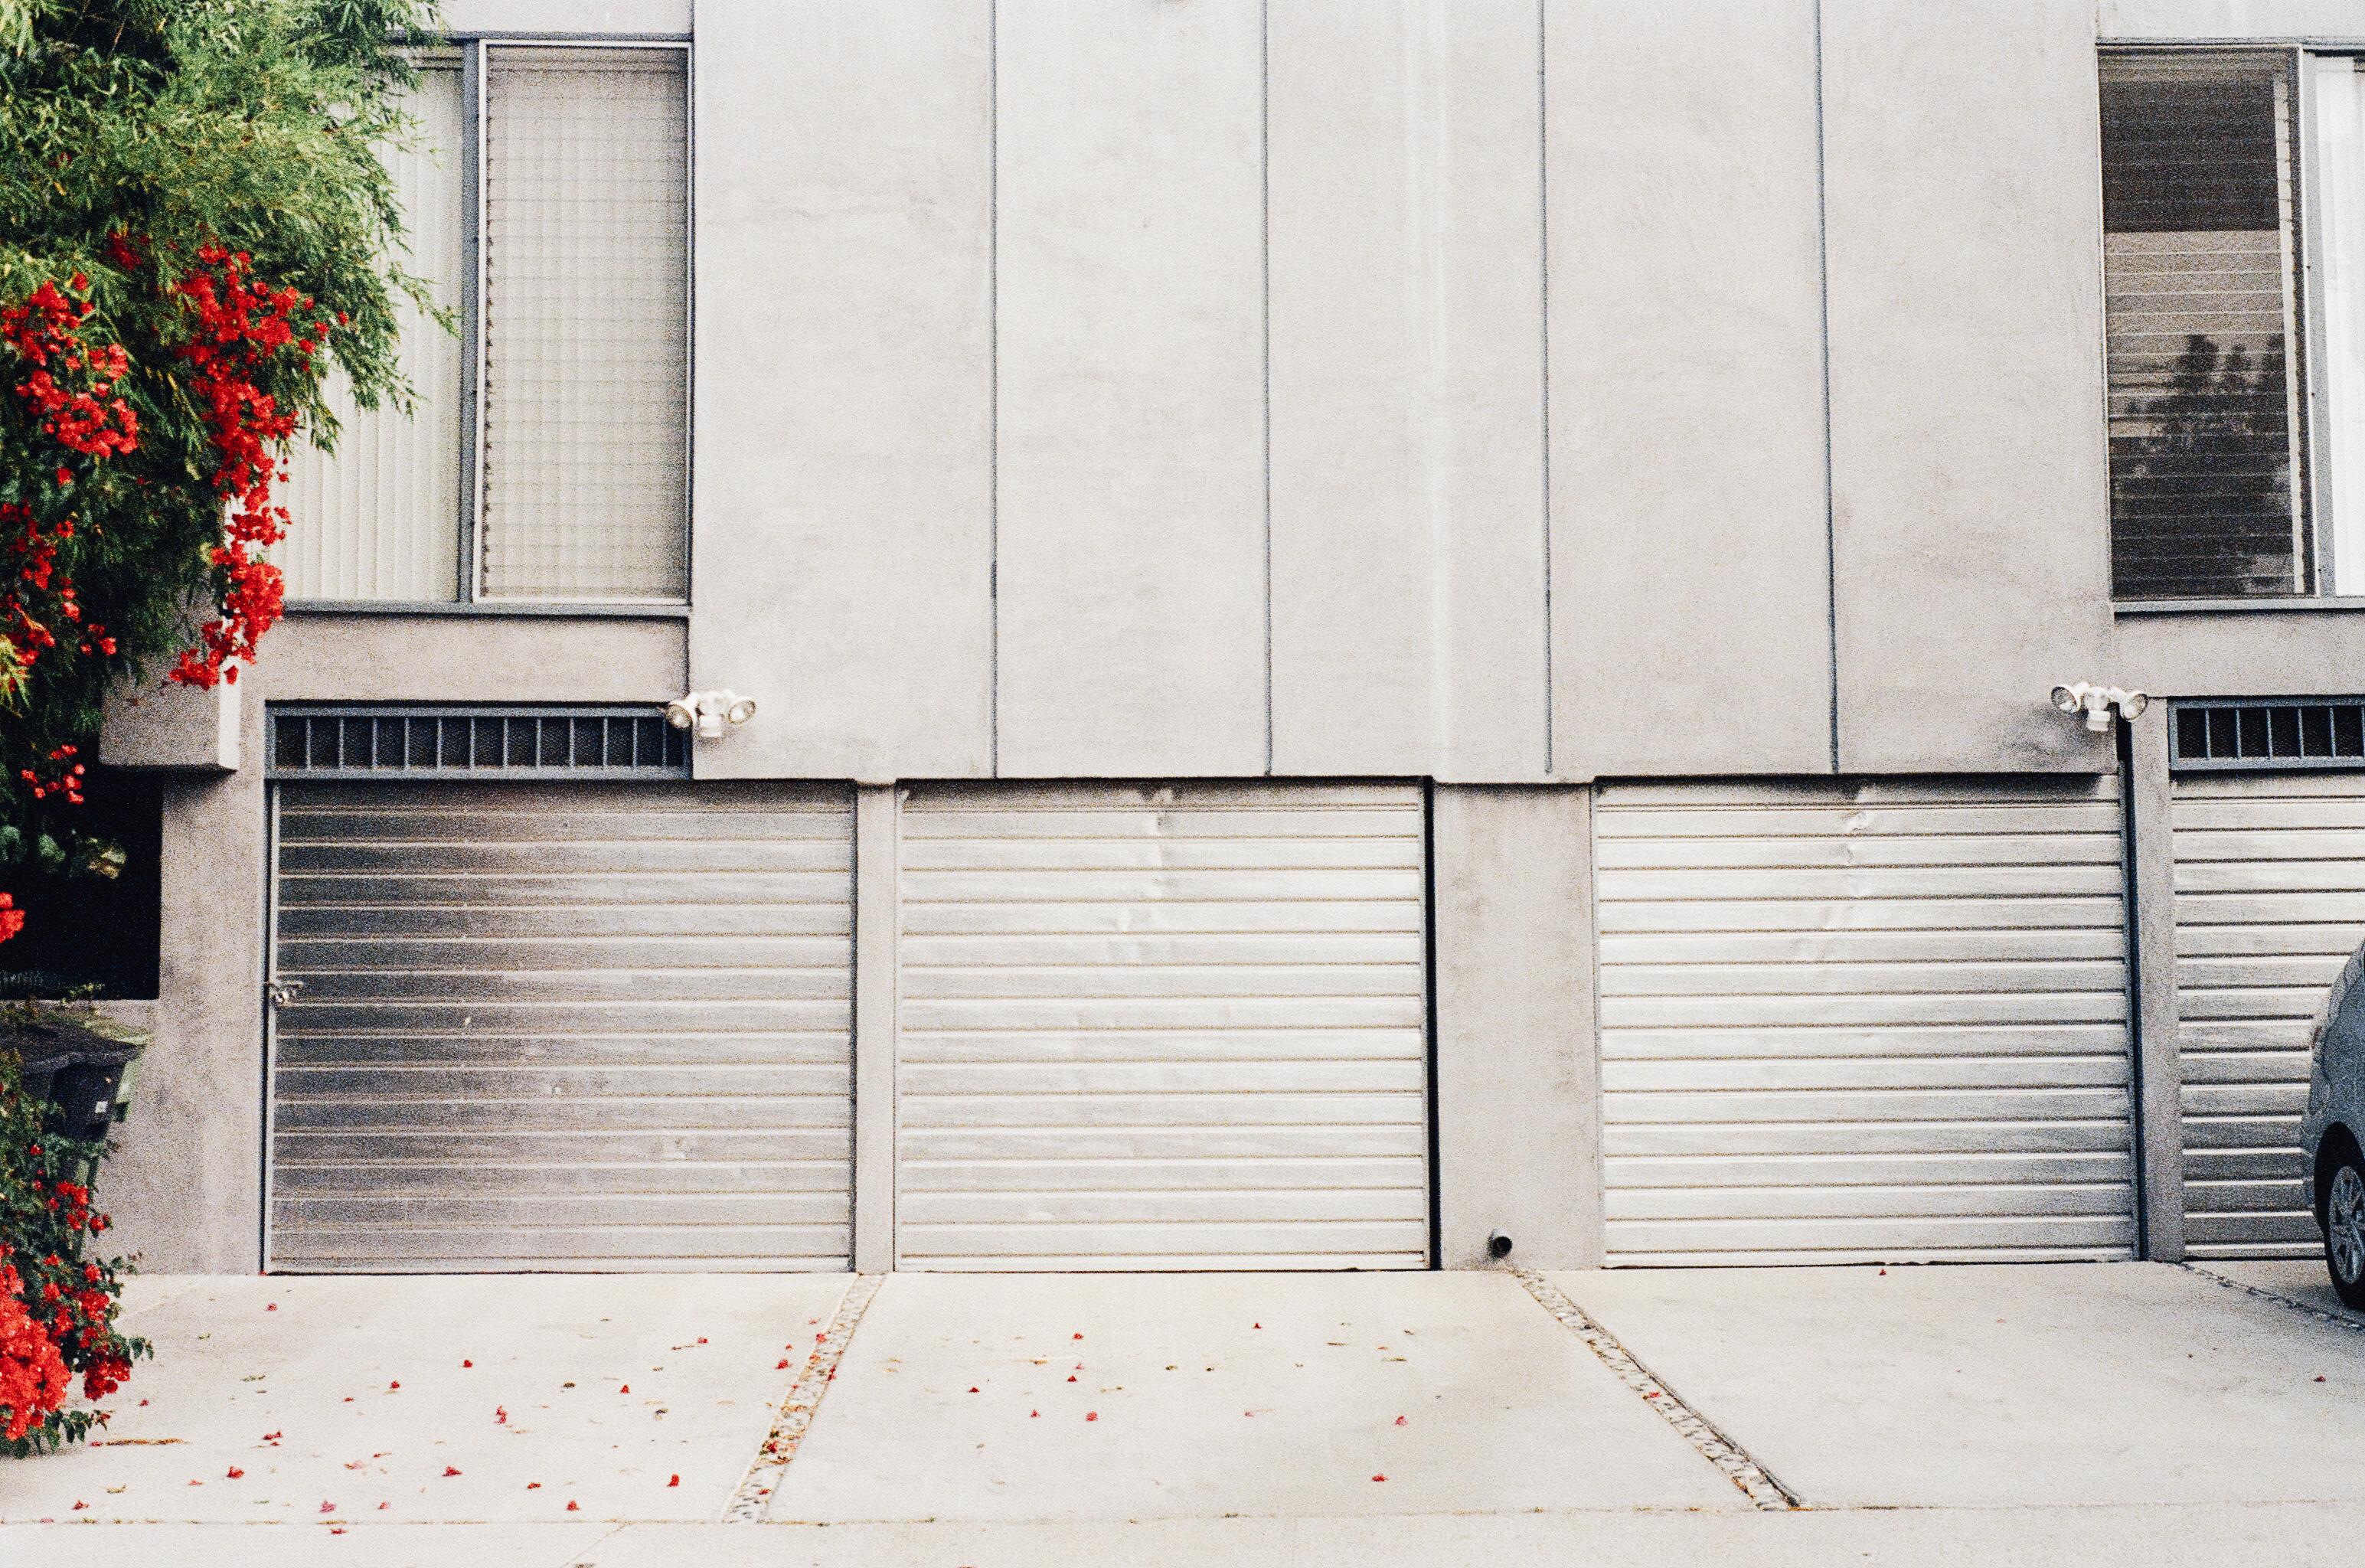 Fotos gratis arquitectura madera blanco casa piso pared fachada garaje mueble dise o - Muebles para garaje ...